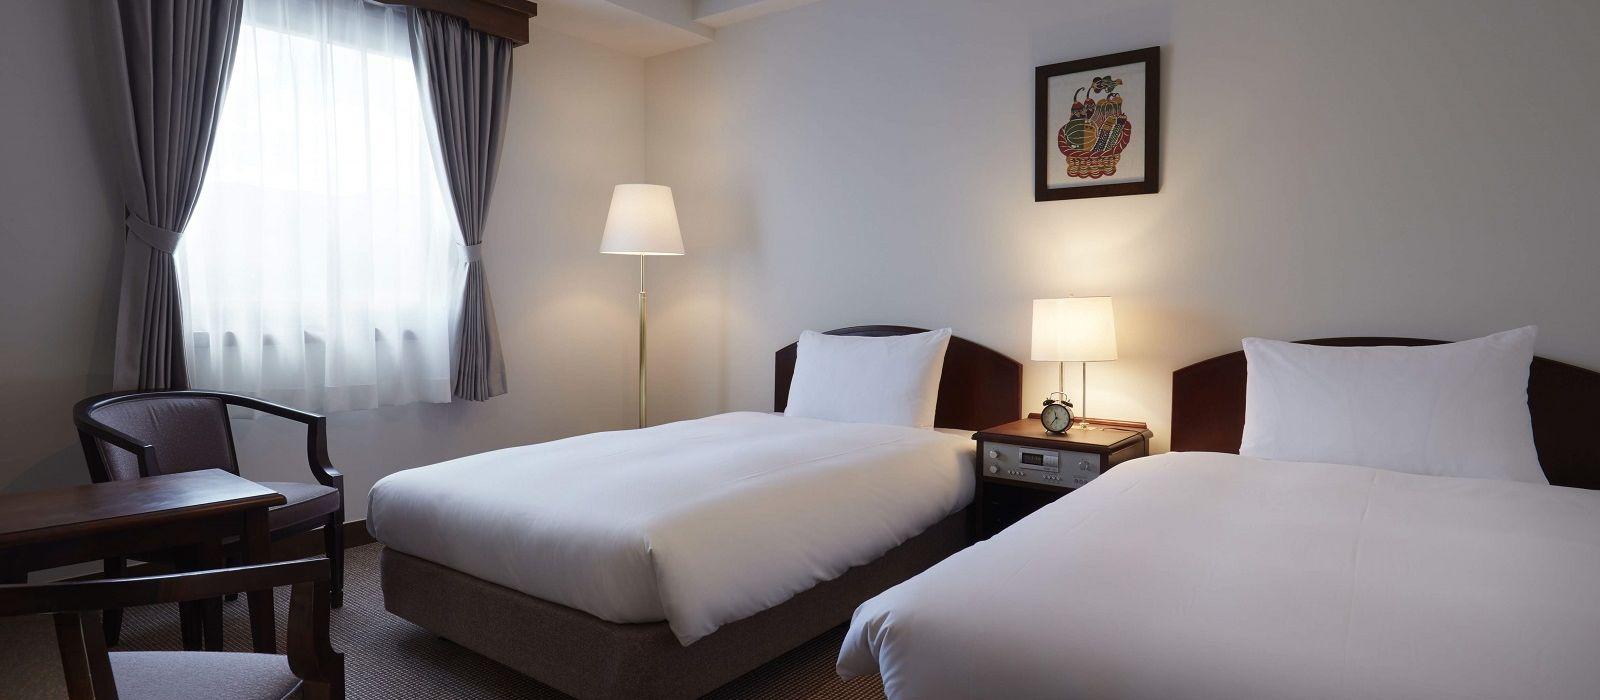 Hotel Matsumoto  Kagetsu Japan